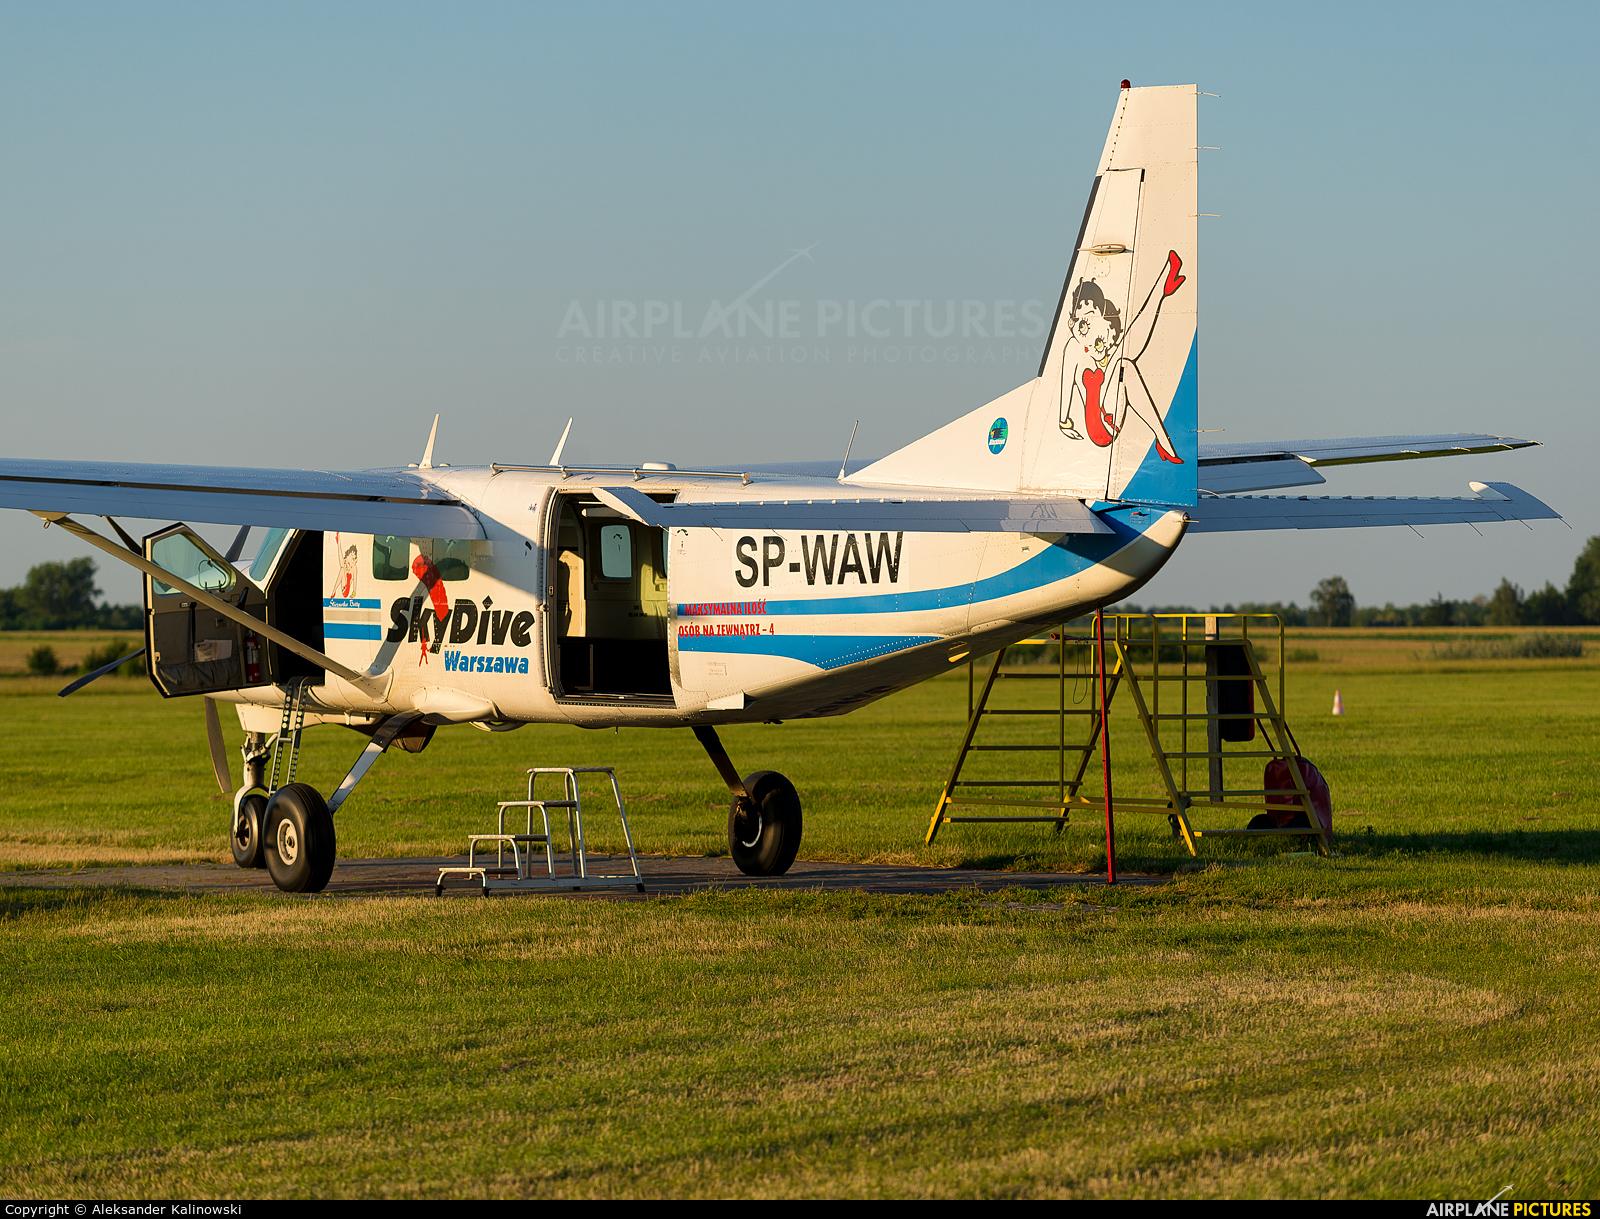 Aeroklub Warszawski SP-WAW aircraft at Chrcynno